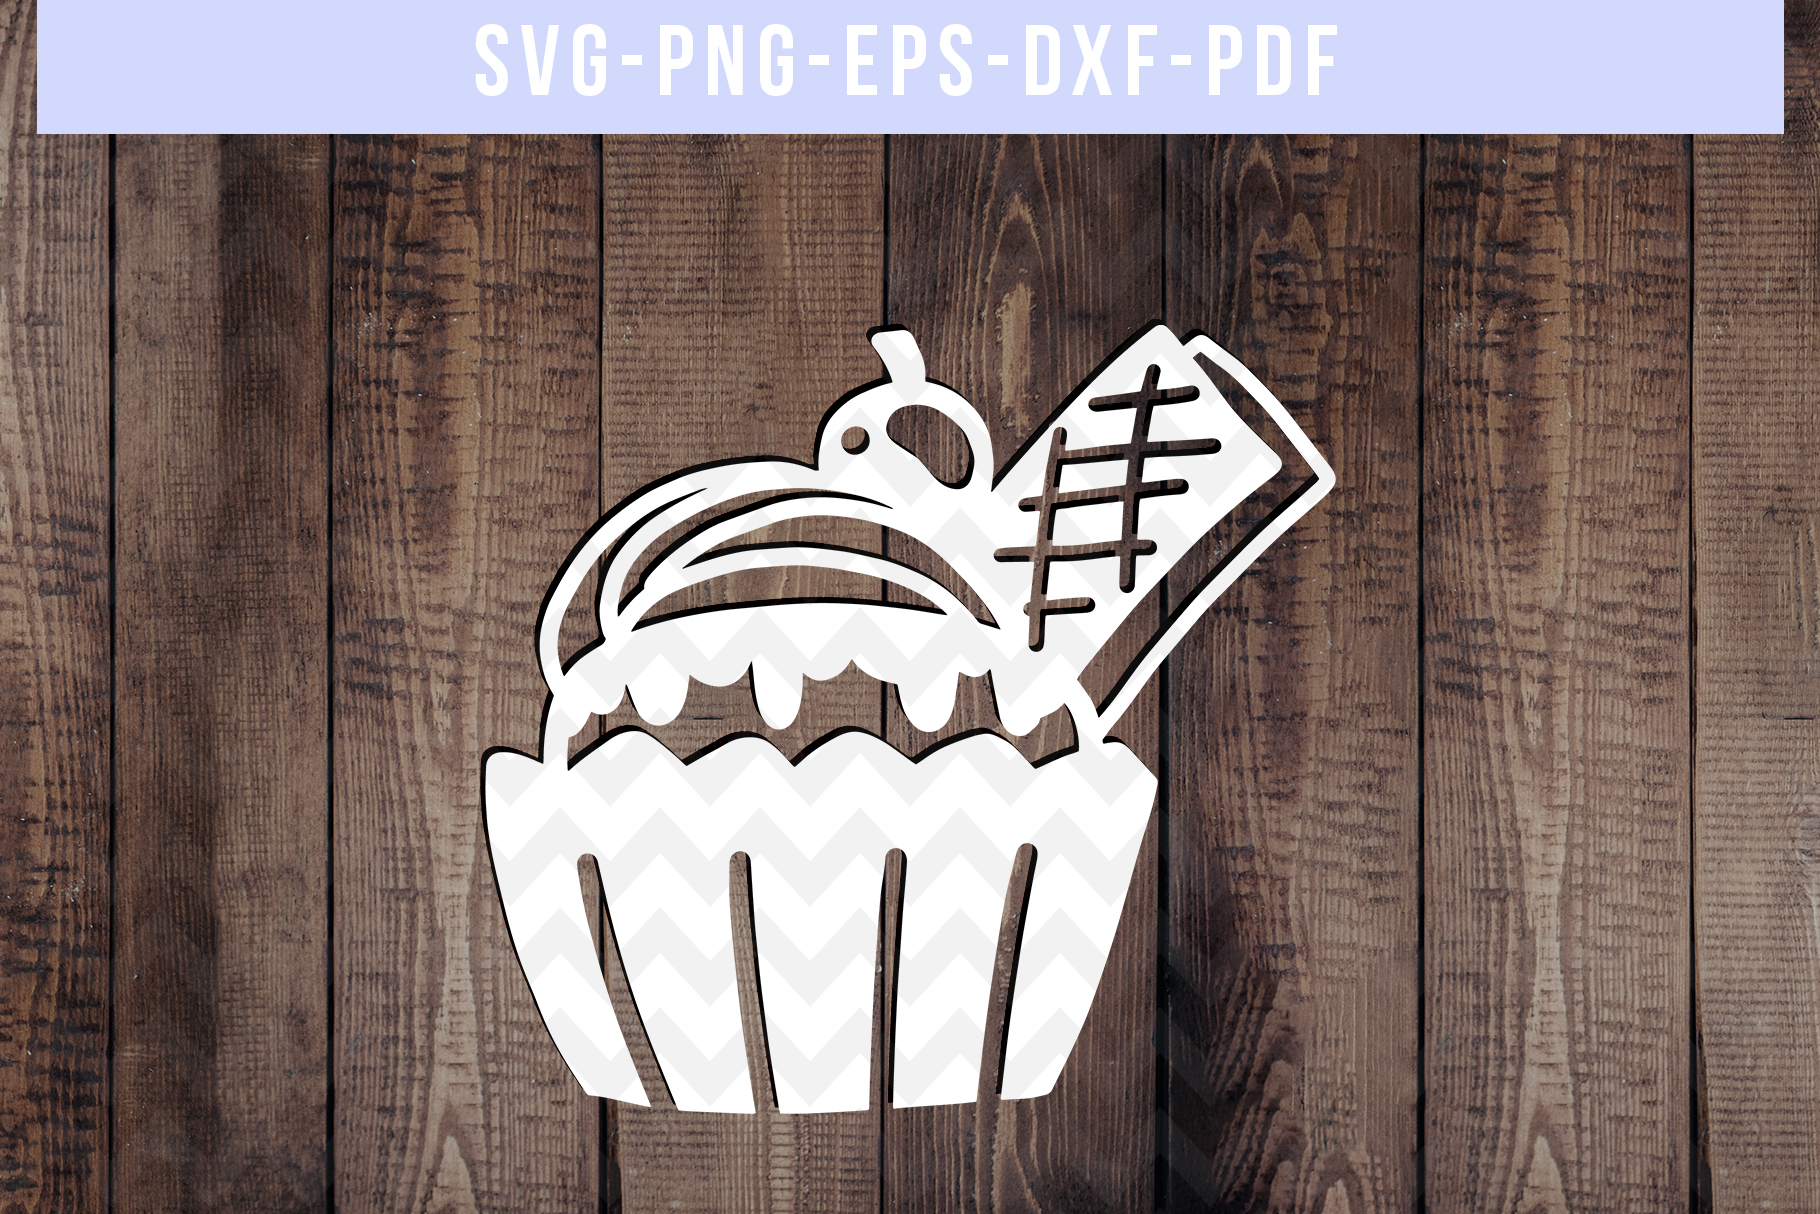 Bundle Of 9 Cupcake Papercut Templates, SVG Cutting File PDF example image 4